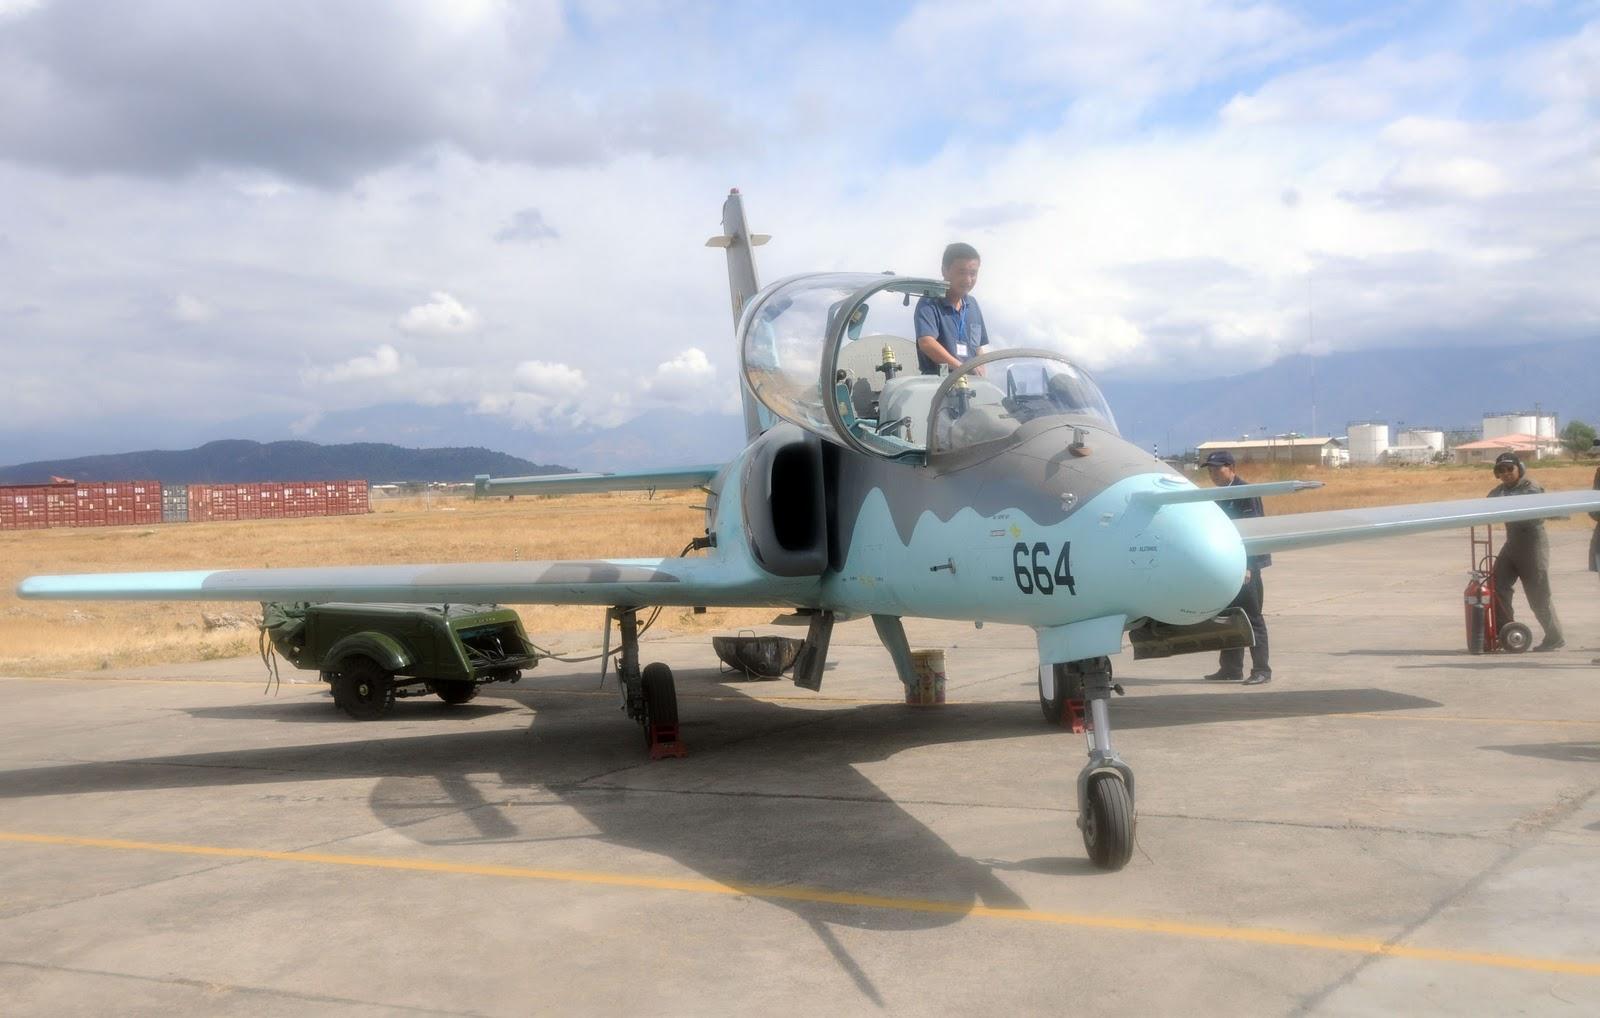 Air+Force+Bolivia+JiaoLian-8+%2528JL-8%2529+K-8+Karakorum+Light+Attack+Jet+Trainer+Aircraft+Hongdu+Aviation+Industry+Corporation+%2528HAIC%2529+of+China+Aeronautical+Complex+%2528PAC%2529++Pakistan+Air+Force+%2528PAF%2529+People%2527s+Liberation+Army+Air+Force++%25284%2529.jpg